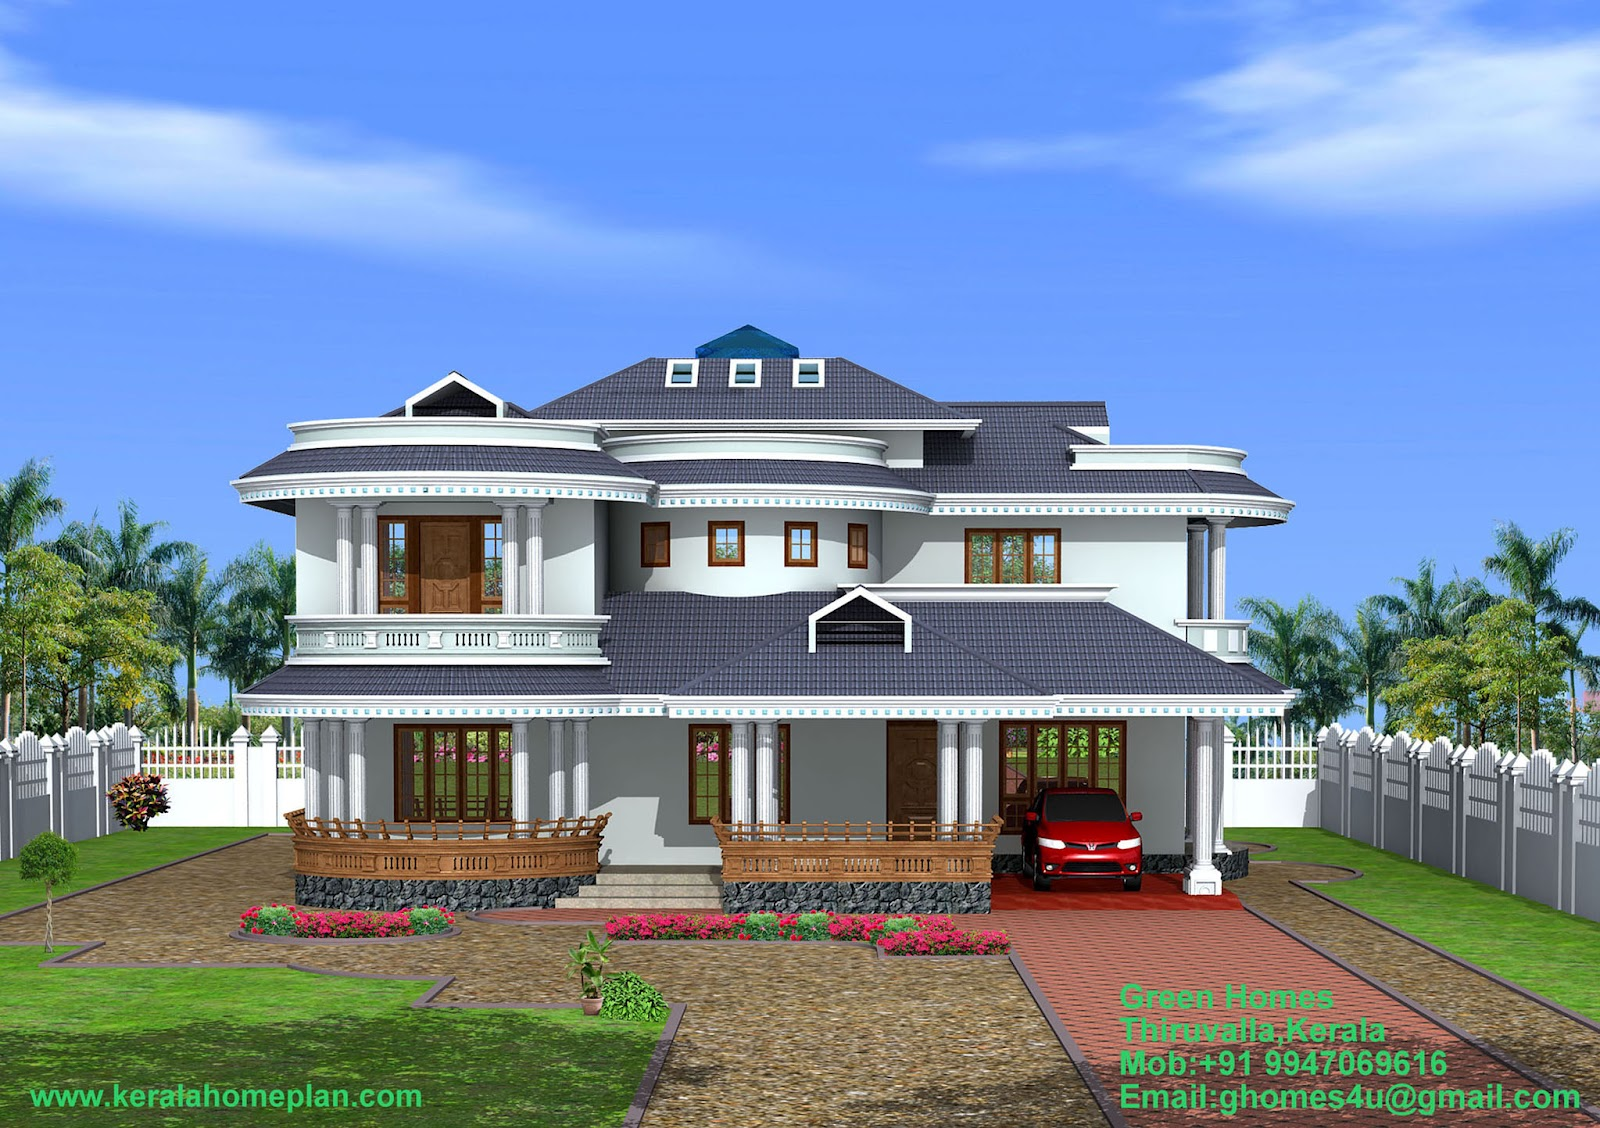 Green Homes Construction Beautiful 4 Bedroom Kerala Home Exterior